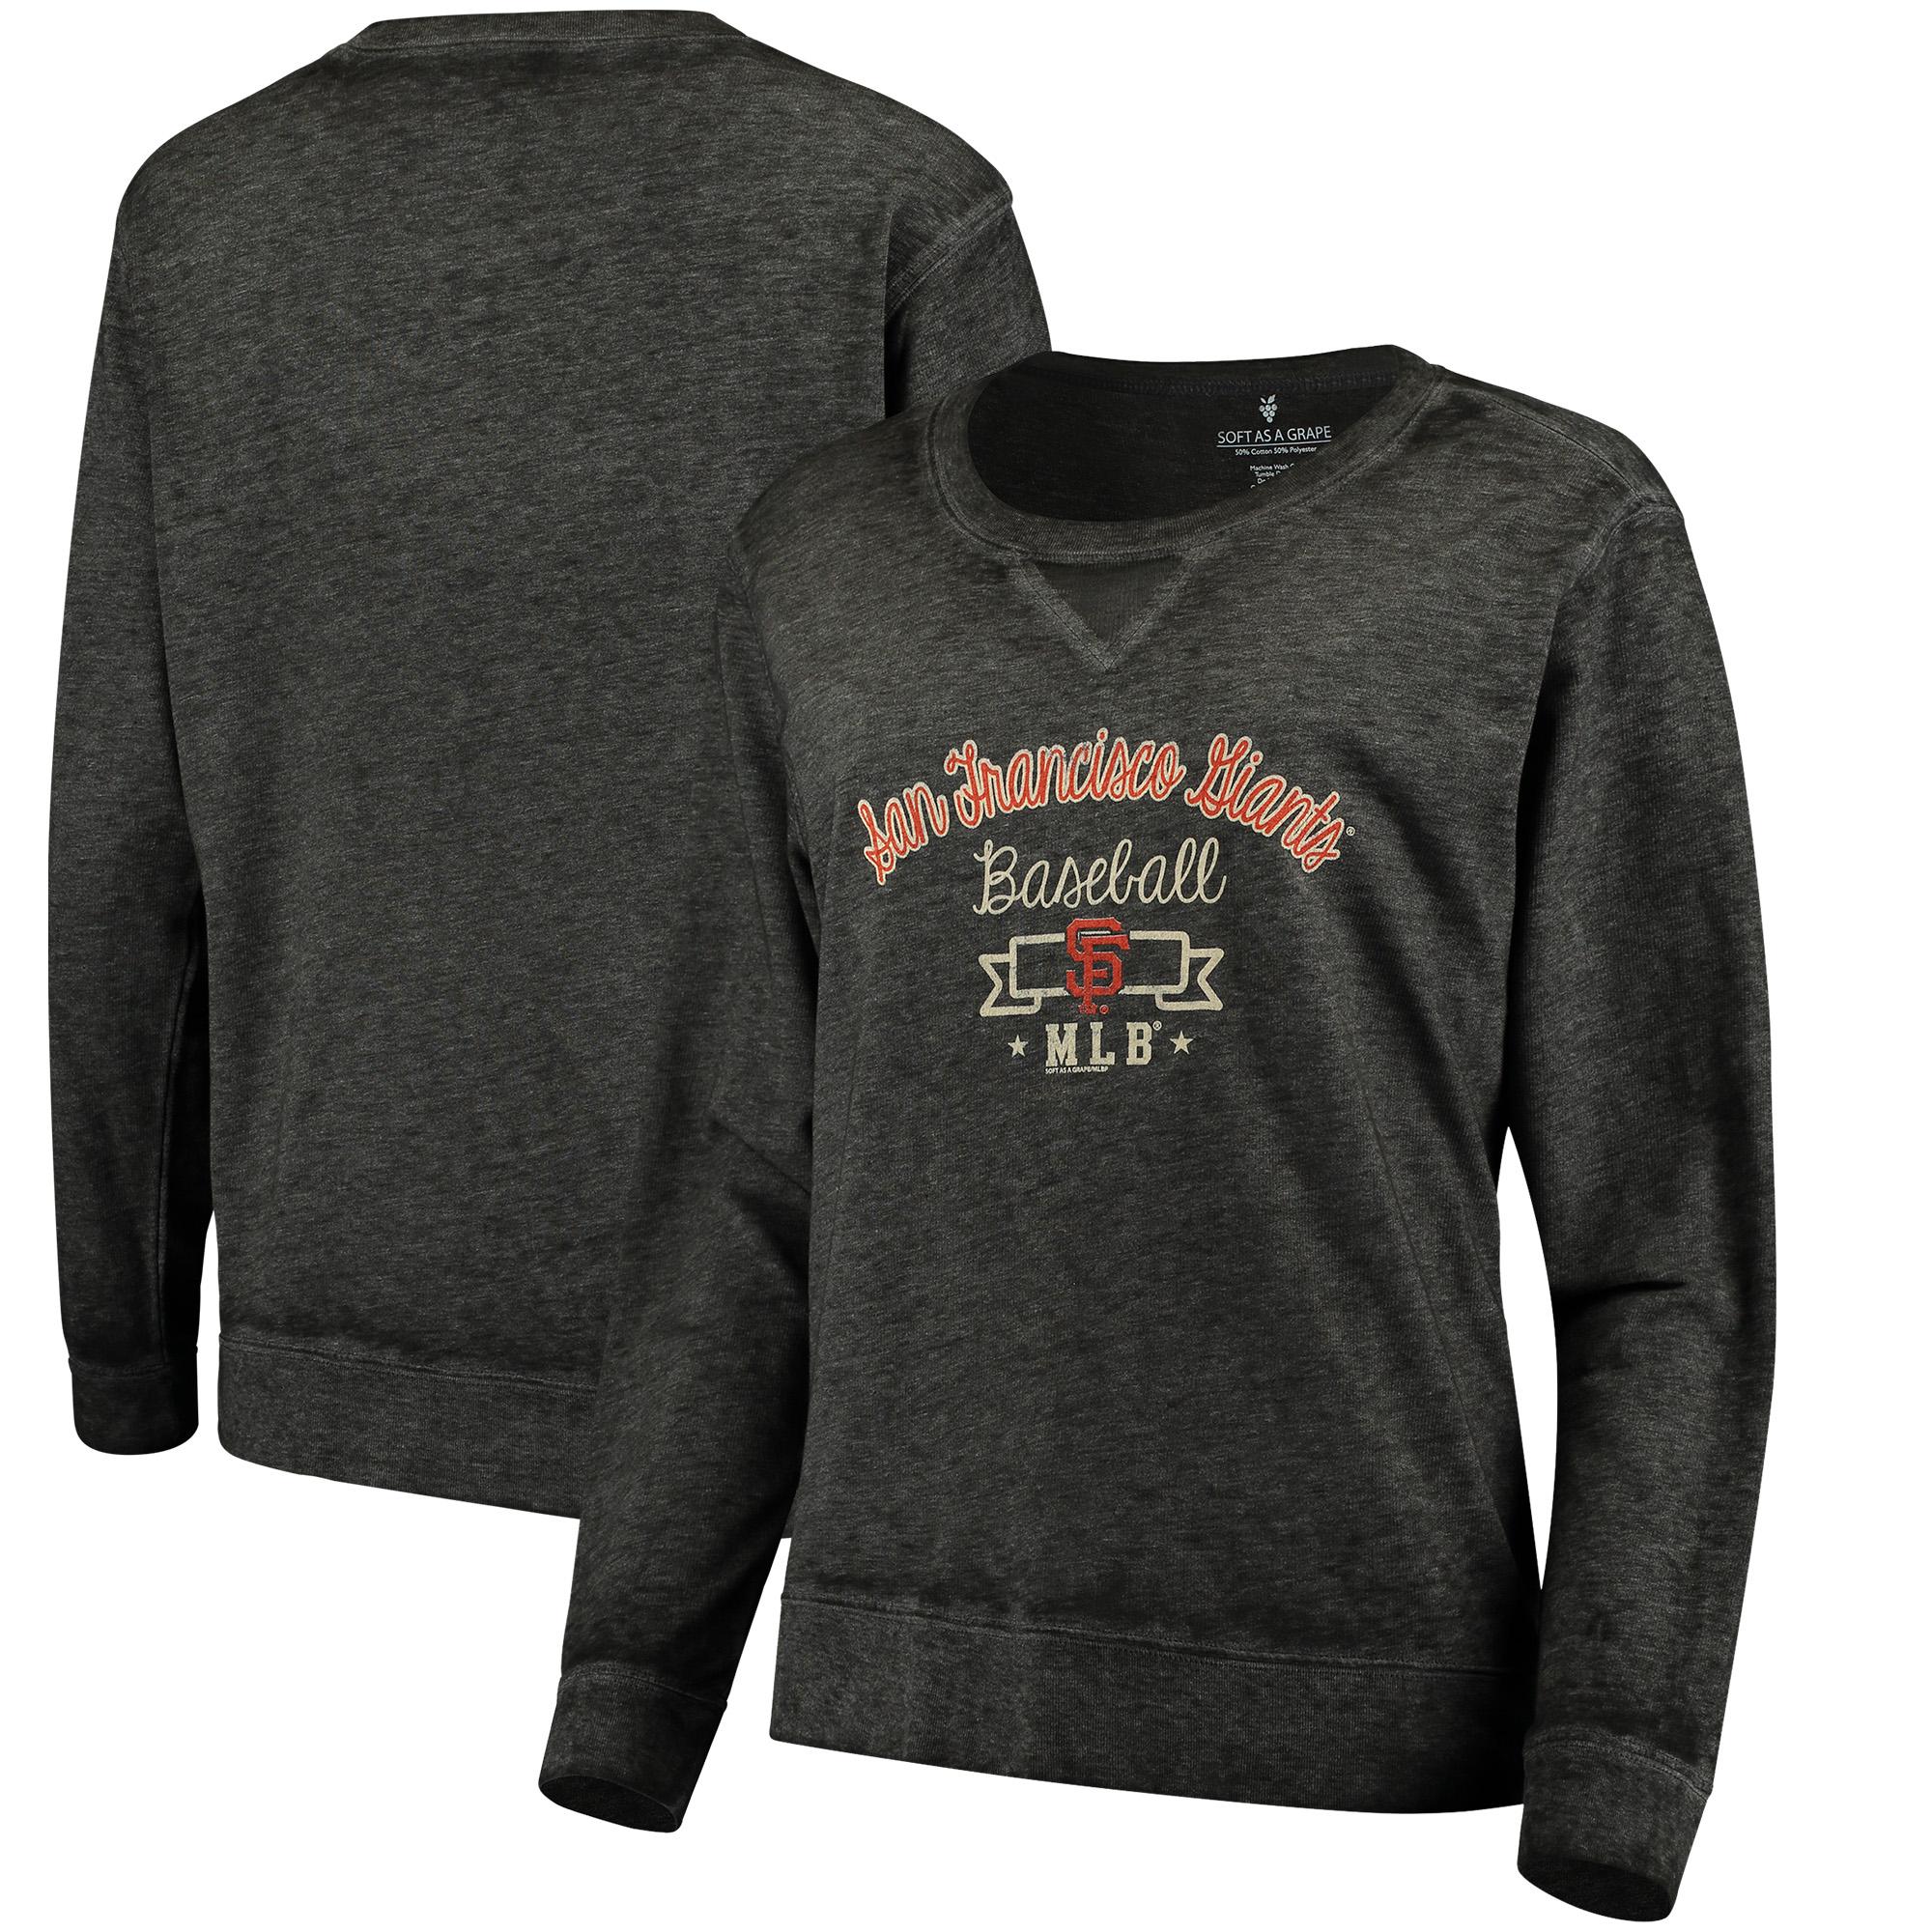 San Francisco Giants Soft as a Grape Women's Home Run Swing Sweatshirt - Black